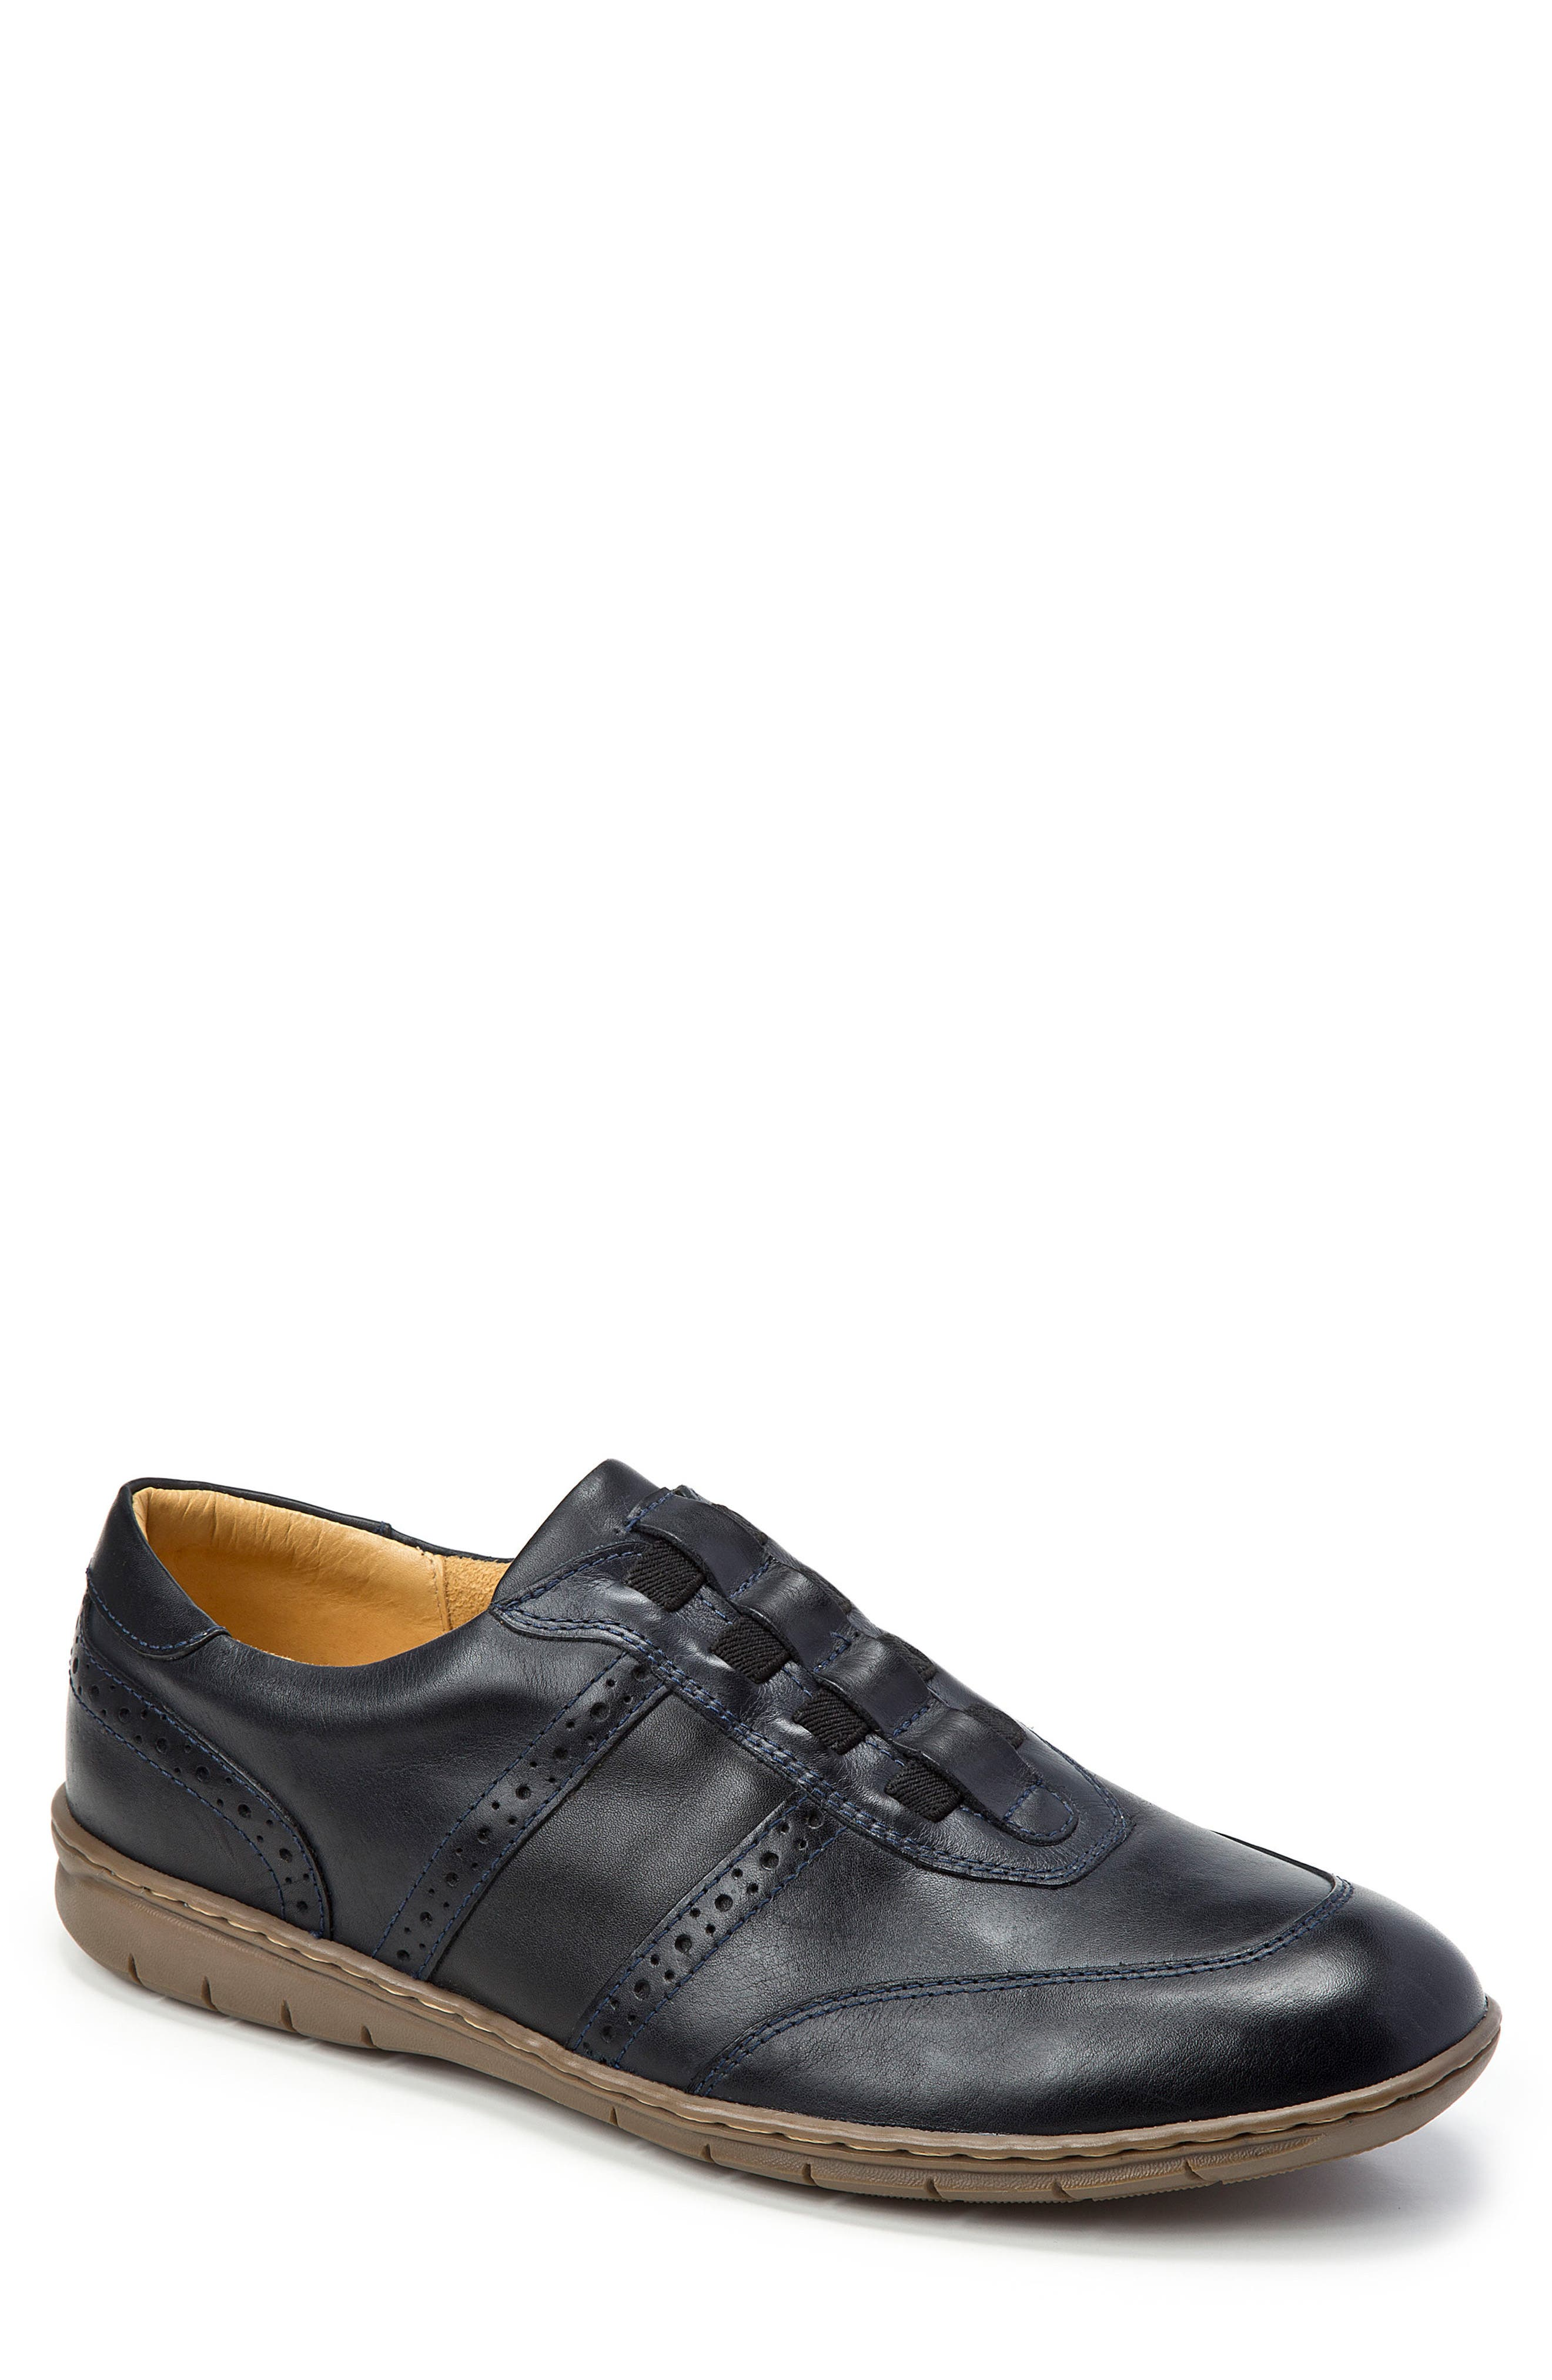 Noah Slip-On Sneaker,                         Main,                         color, BLACK